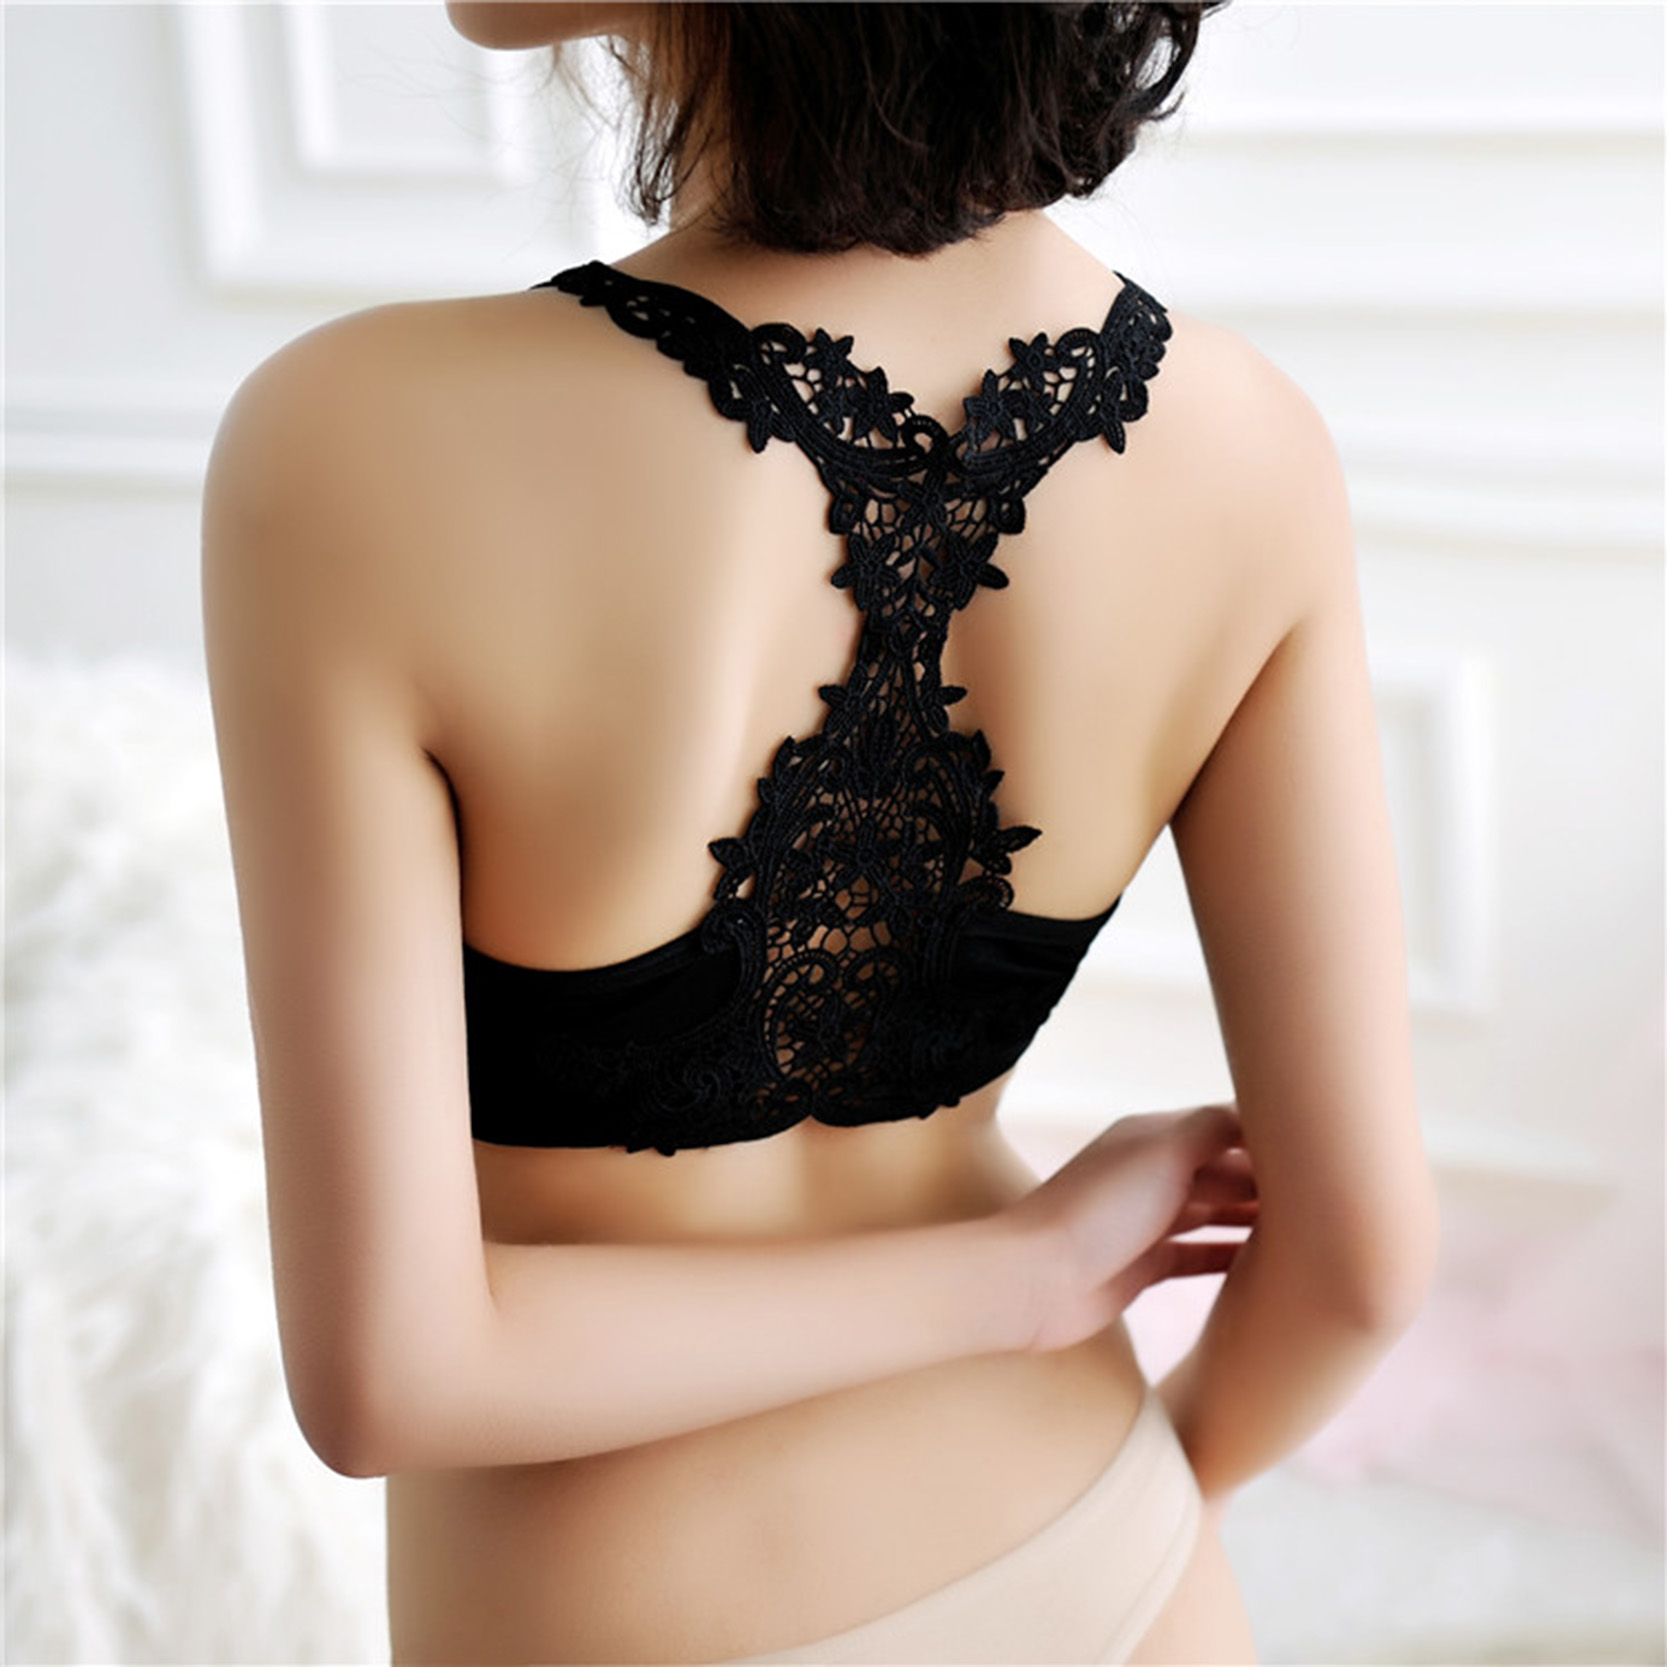 Solid Black & White Women Fashion Trim Bra Sexy Lace Jacquard Wide Straps Tube Tops Soft Push Up Deep V Cross Back Bra